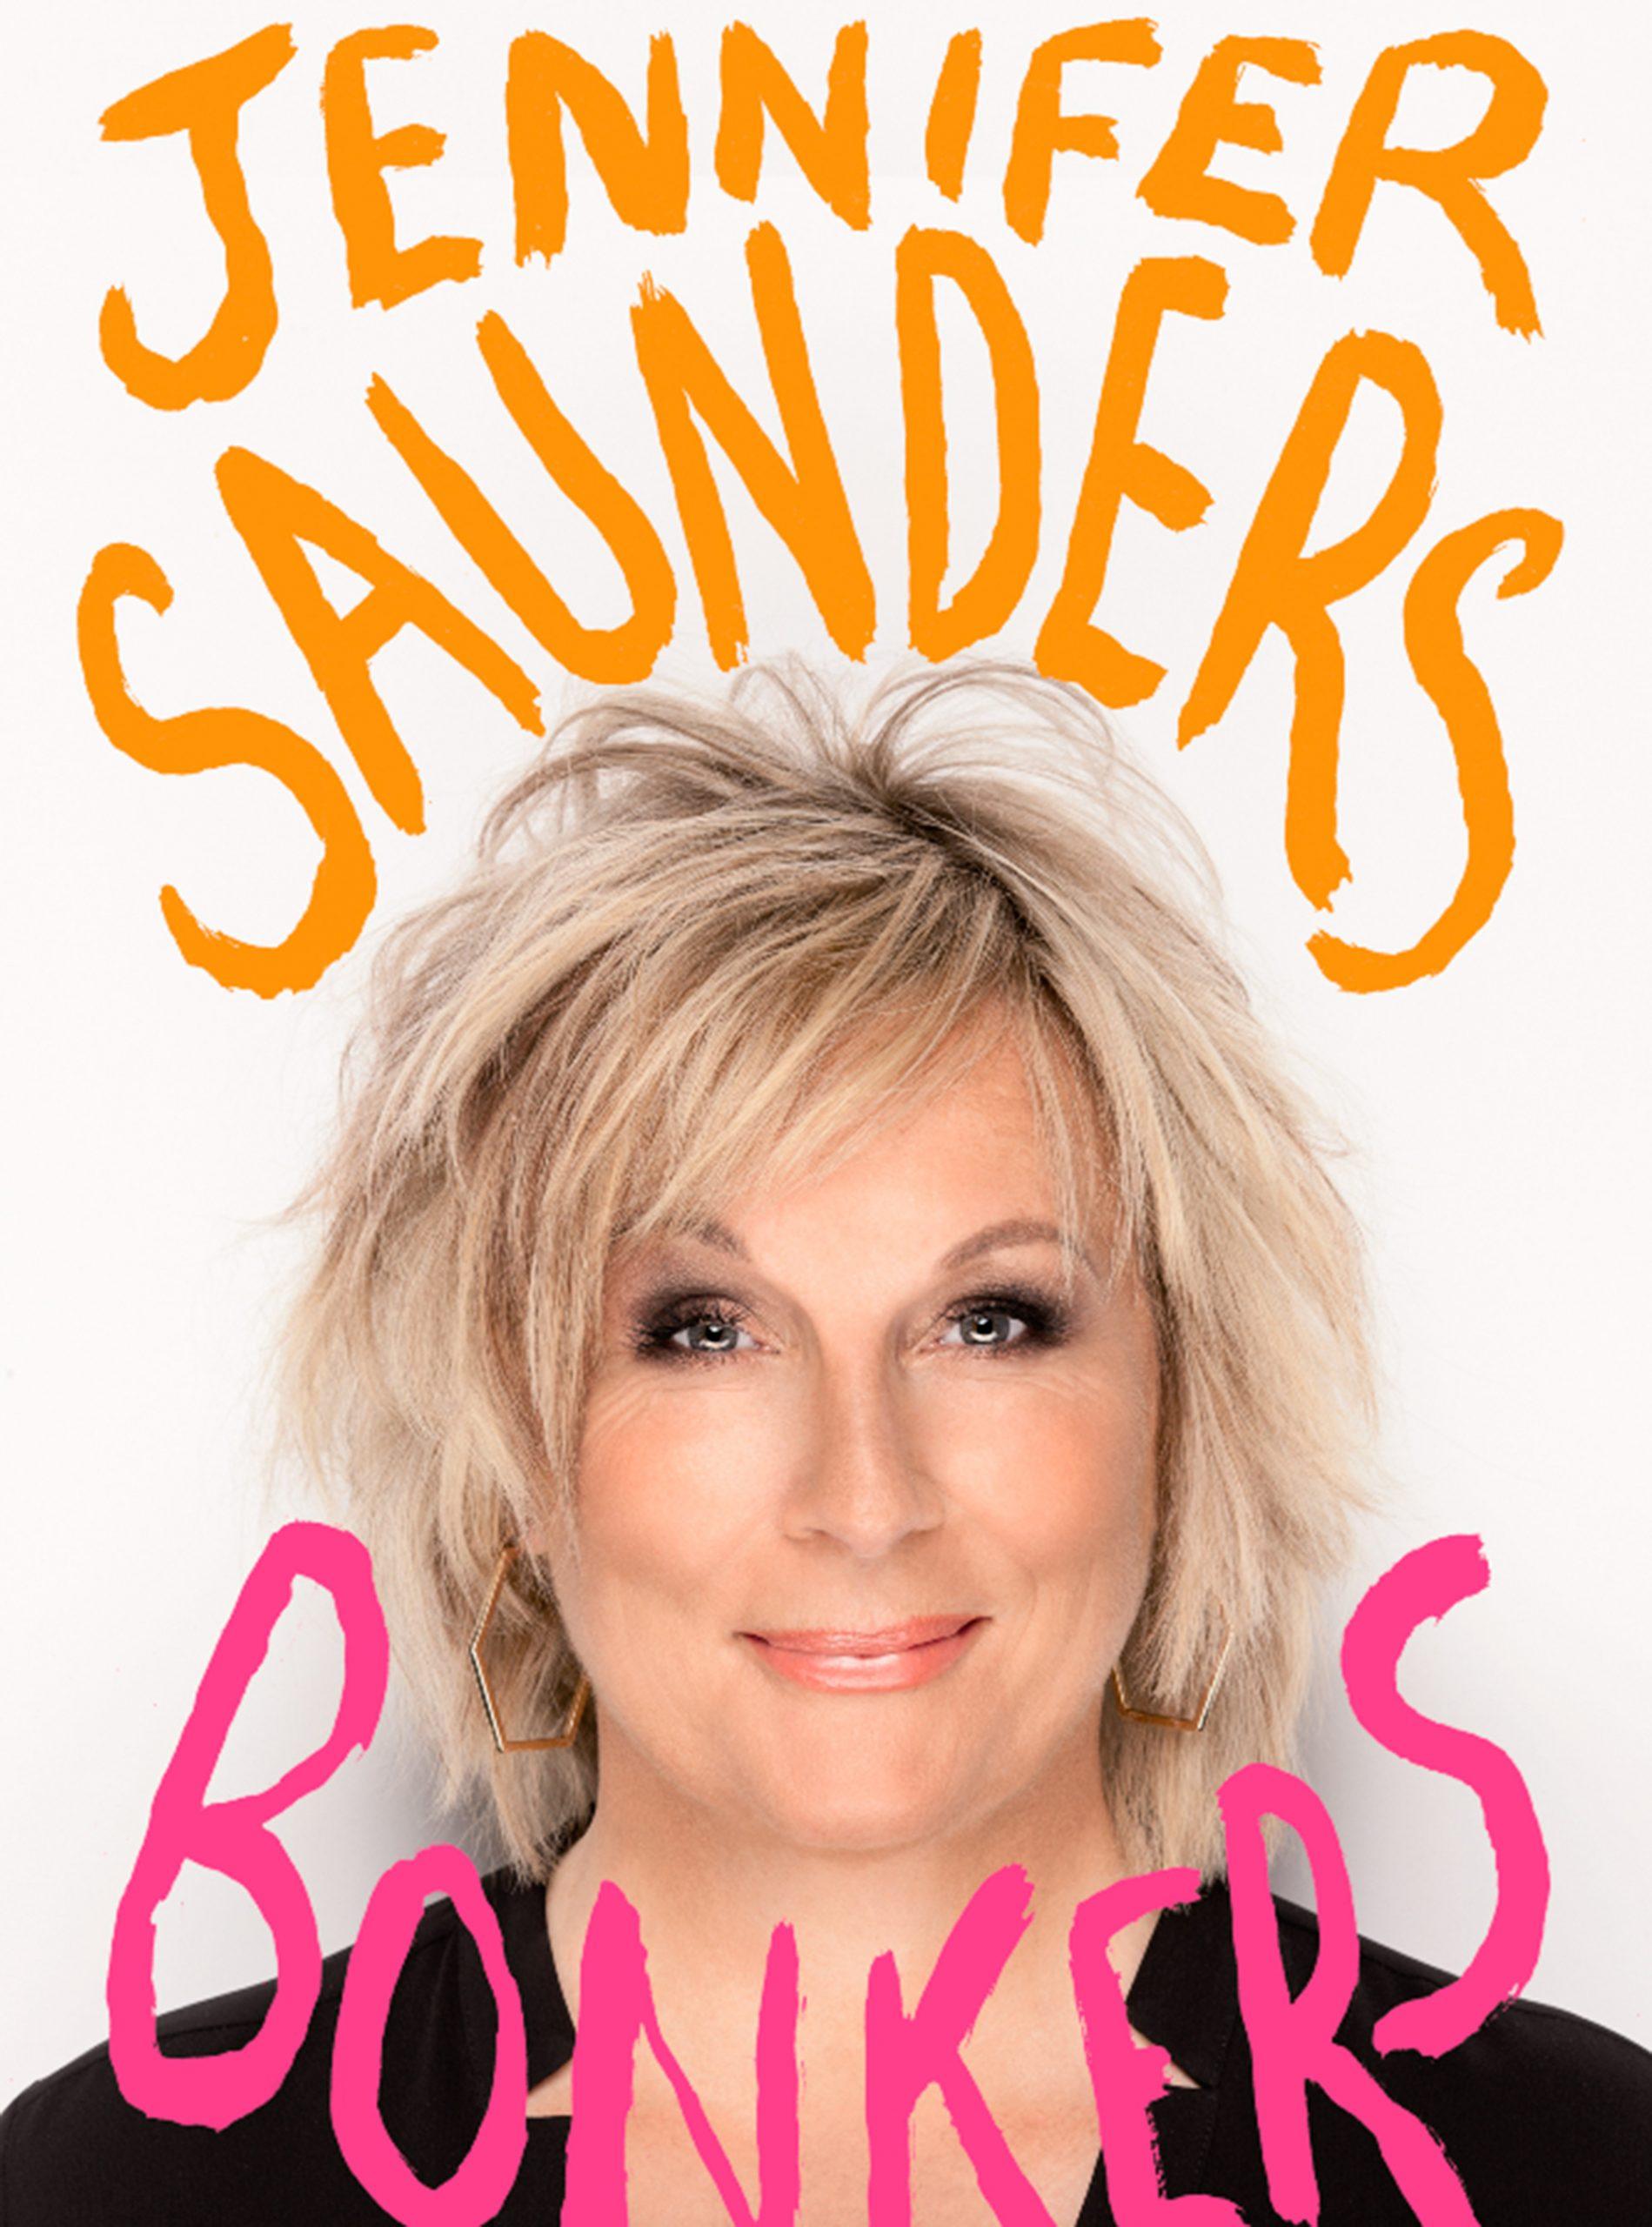 Jennifer Saunders Bonkers book